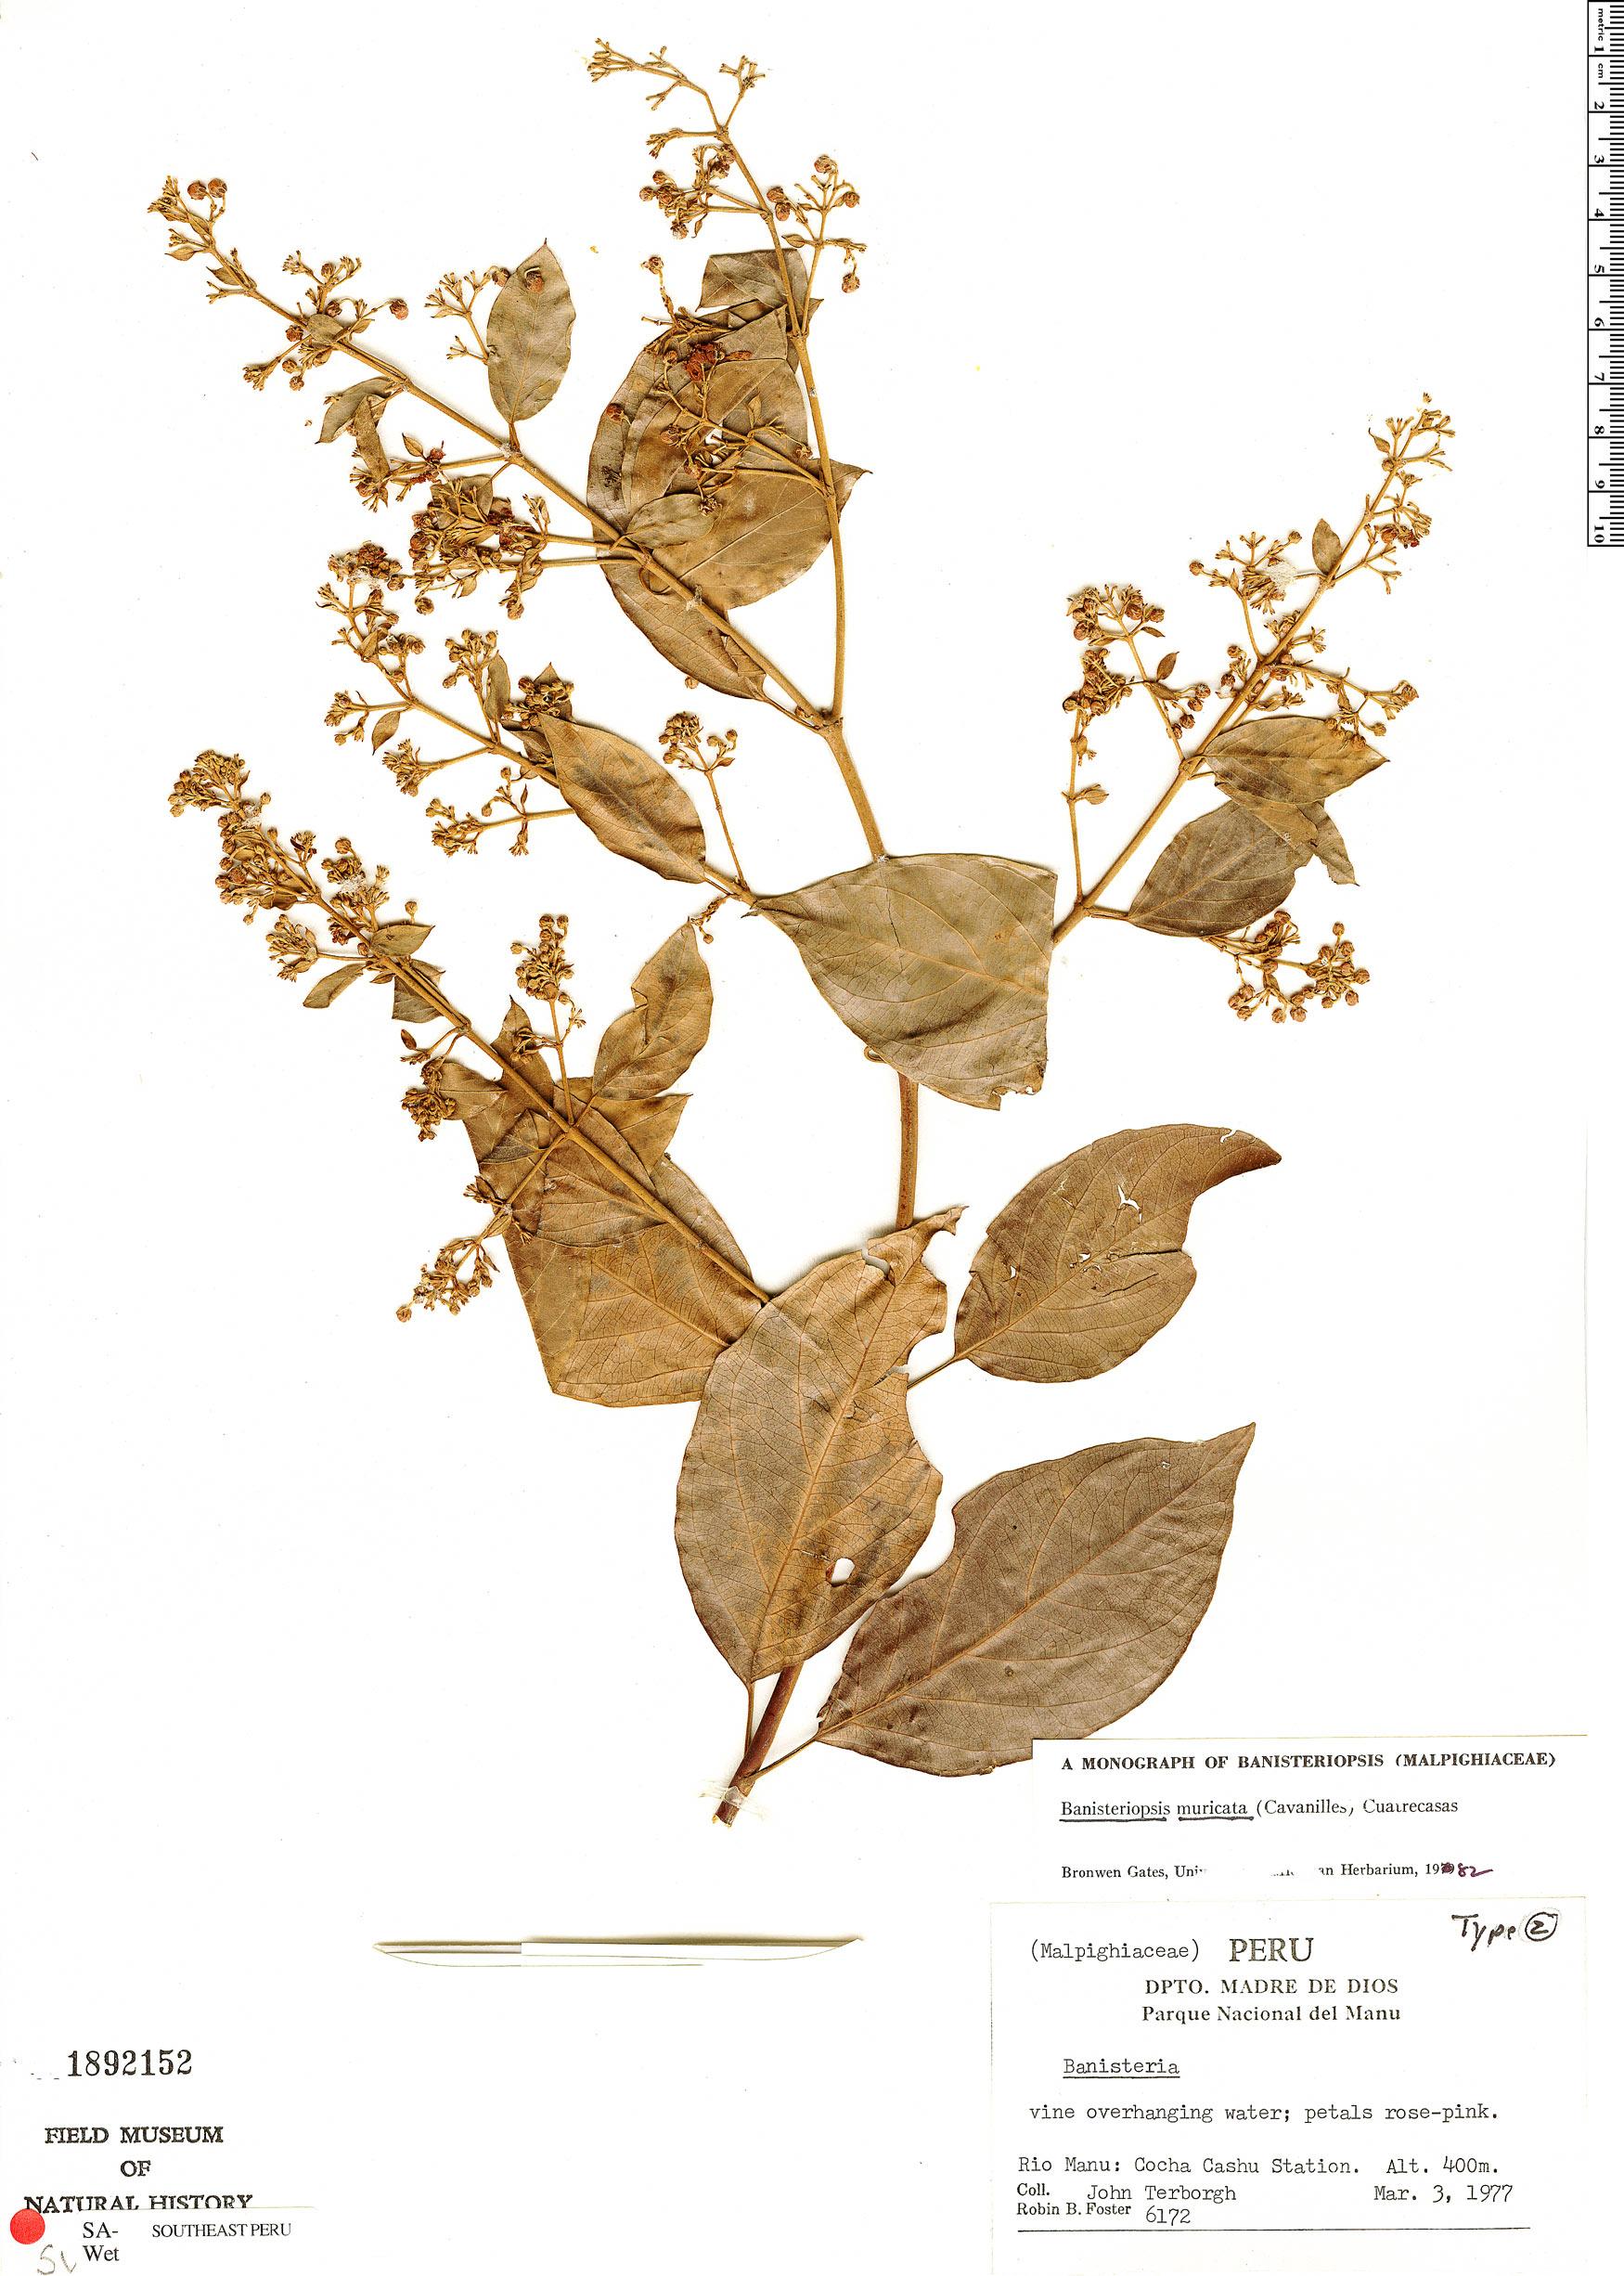 Espécimen: Banisteriopsis muricata